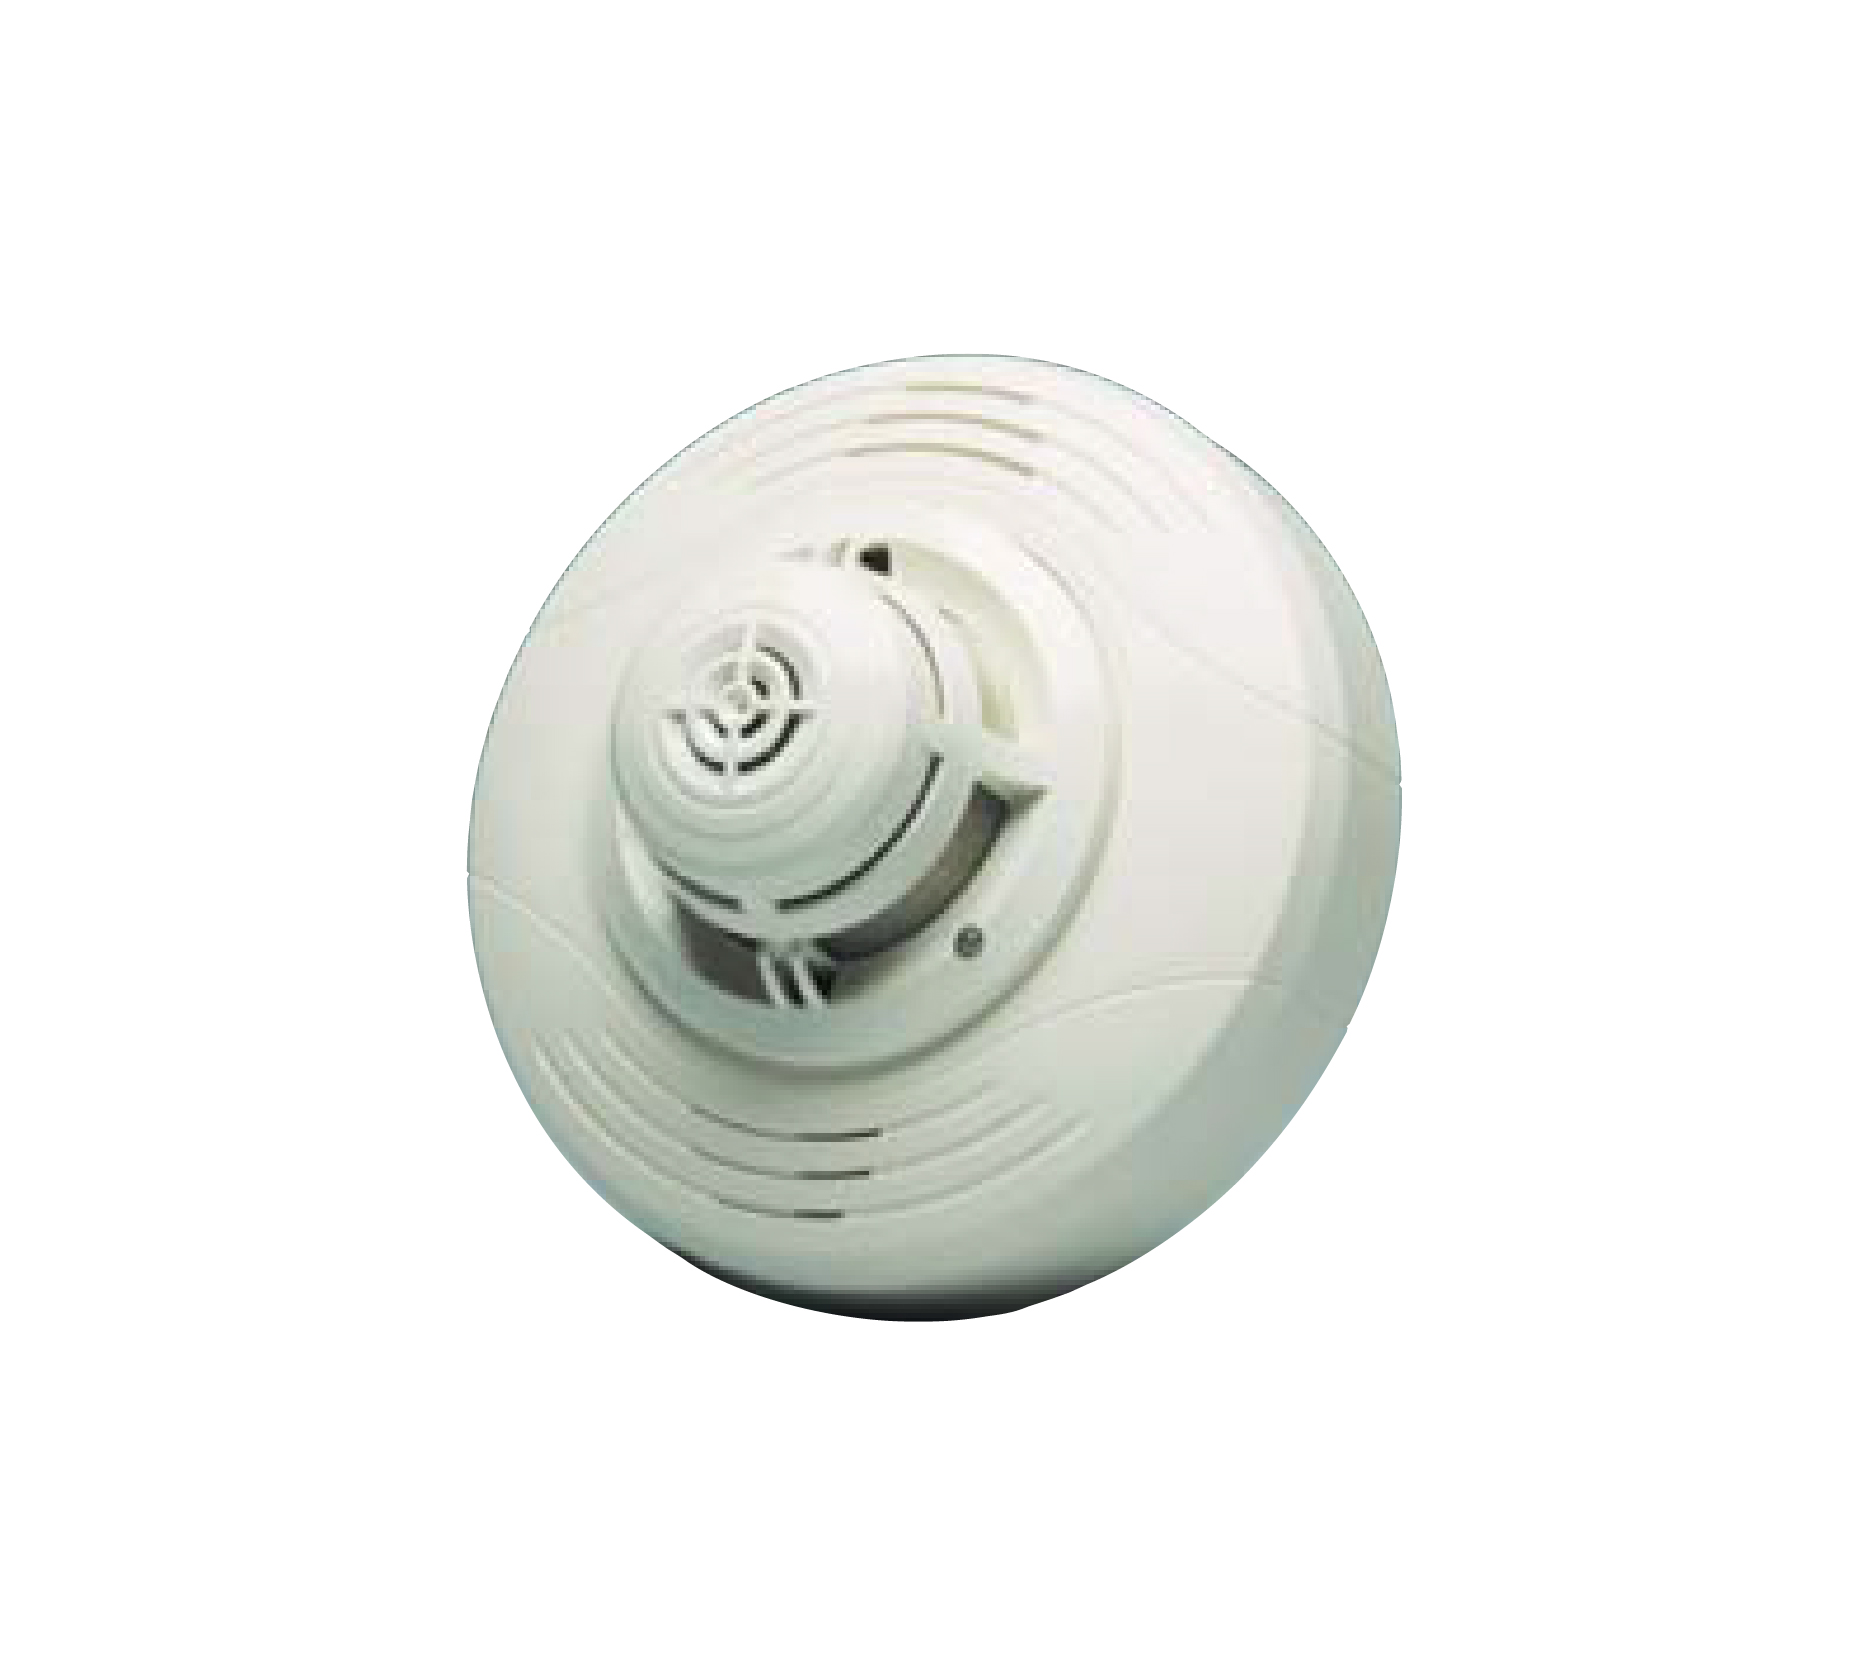 Notifier Addressable Fire Alarm System - Channel Partners - Qutak